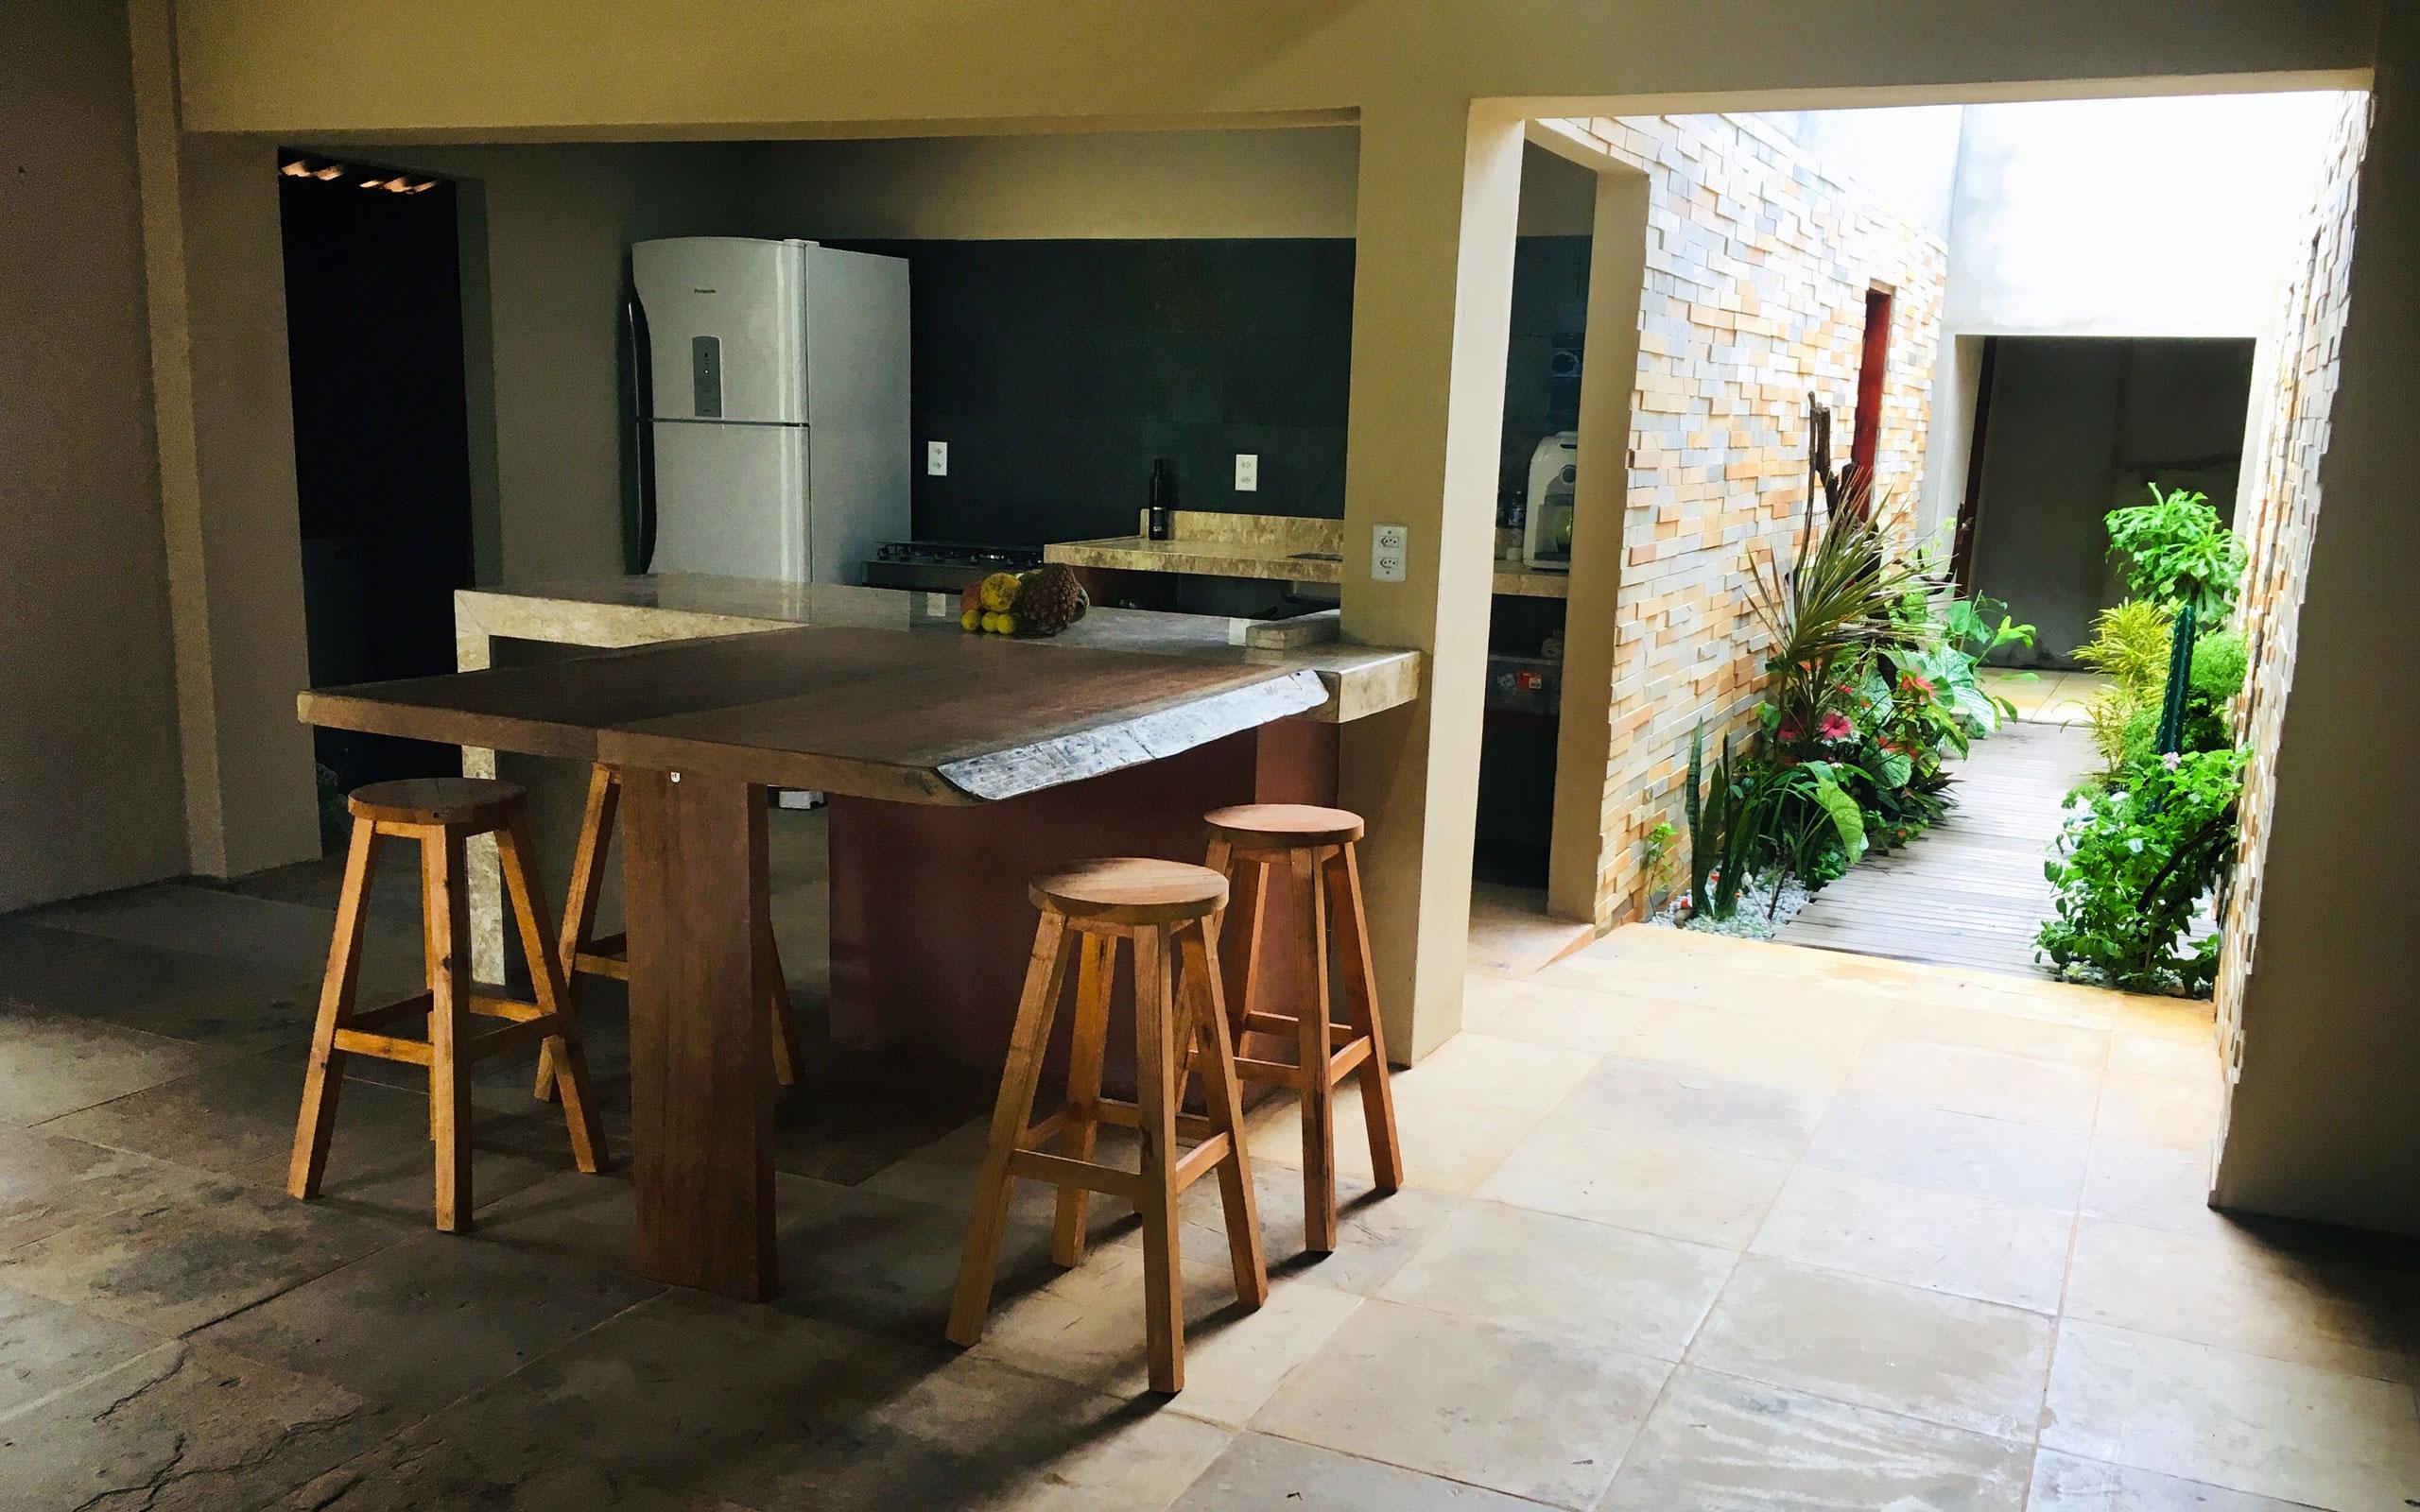 vilakapa-parajuru-bresil-maison-vila-kapa-cuisine-05a-2560